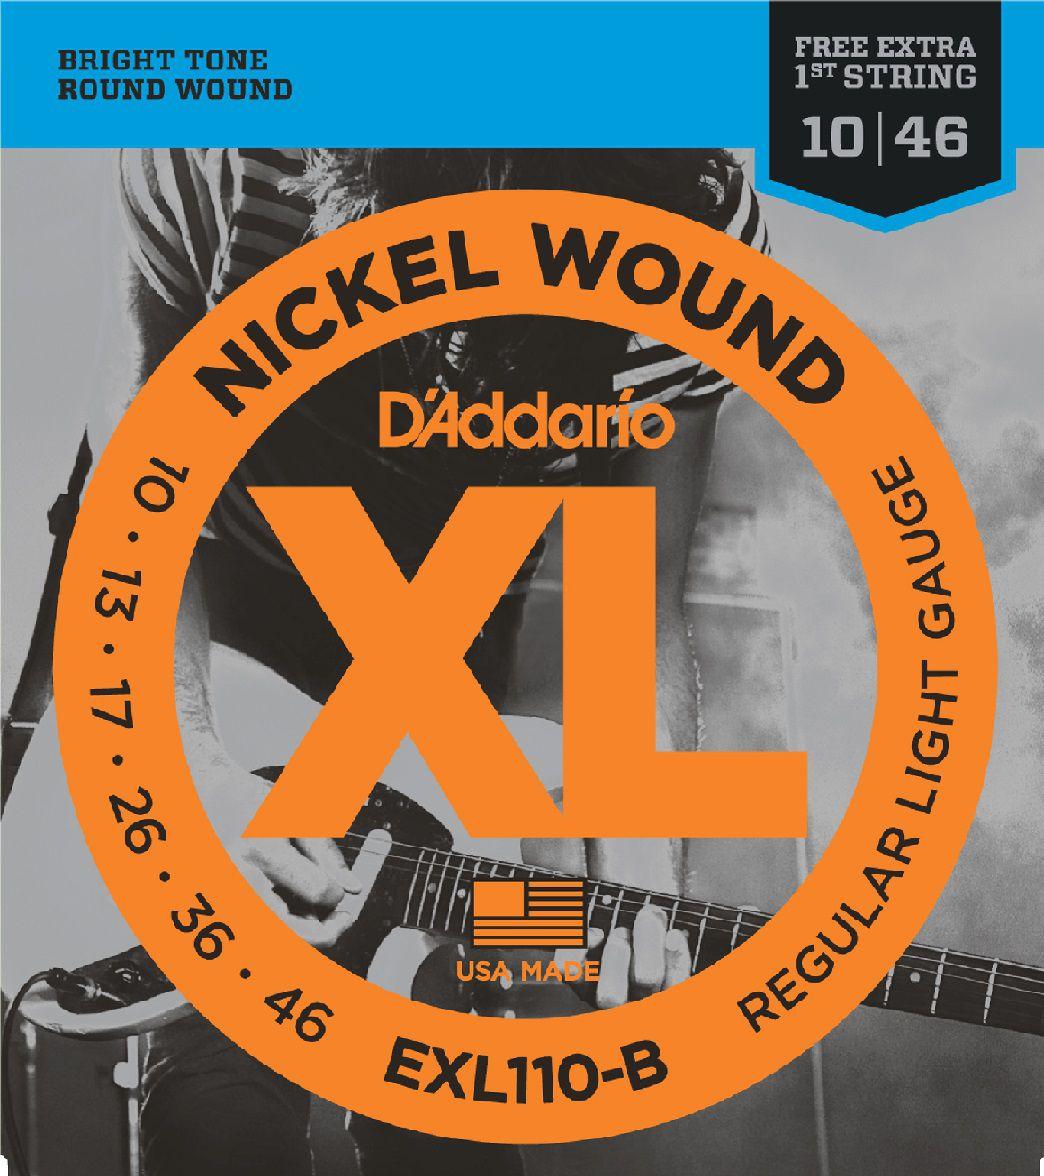 Kit 4 Encordoamento Cordas Guitarra Daddario Exl110 B 010